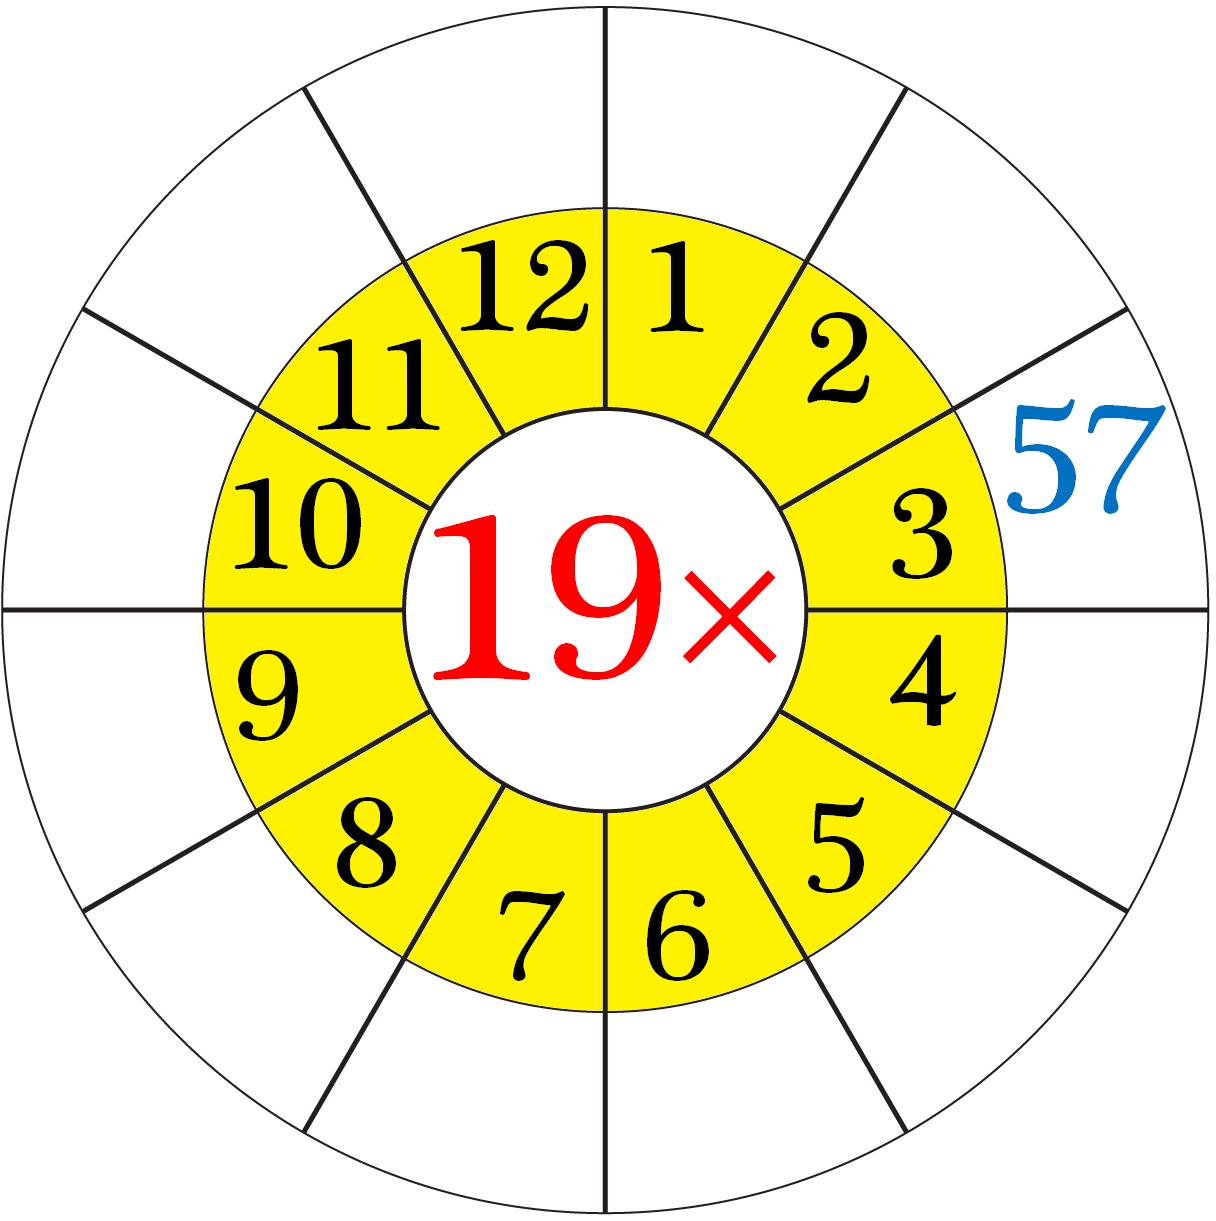 19 Times Multiplication Table Worksheet